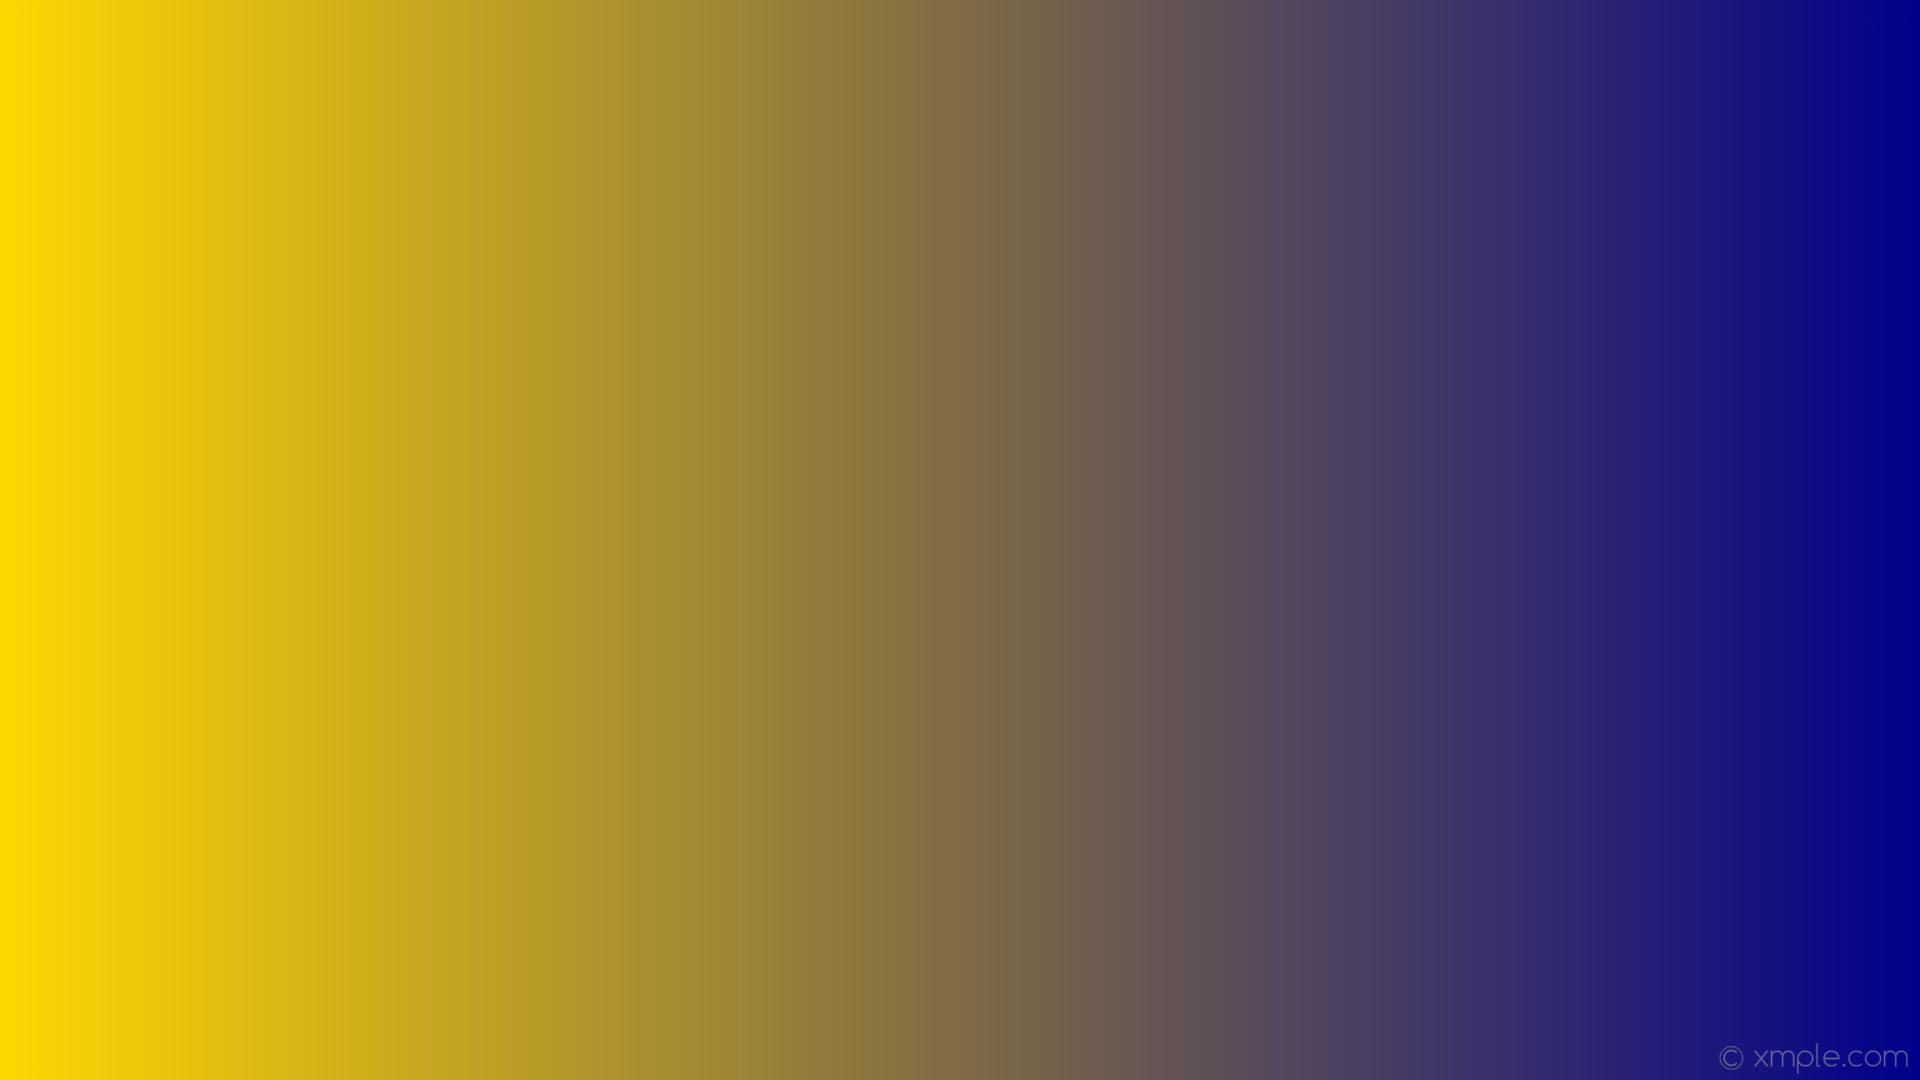 wallpaper yellow gradient linear blue gold dark blue #ffd700 #00008b 180°